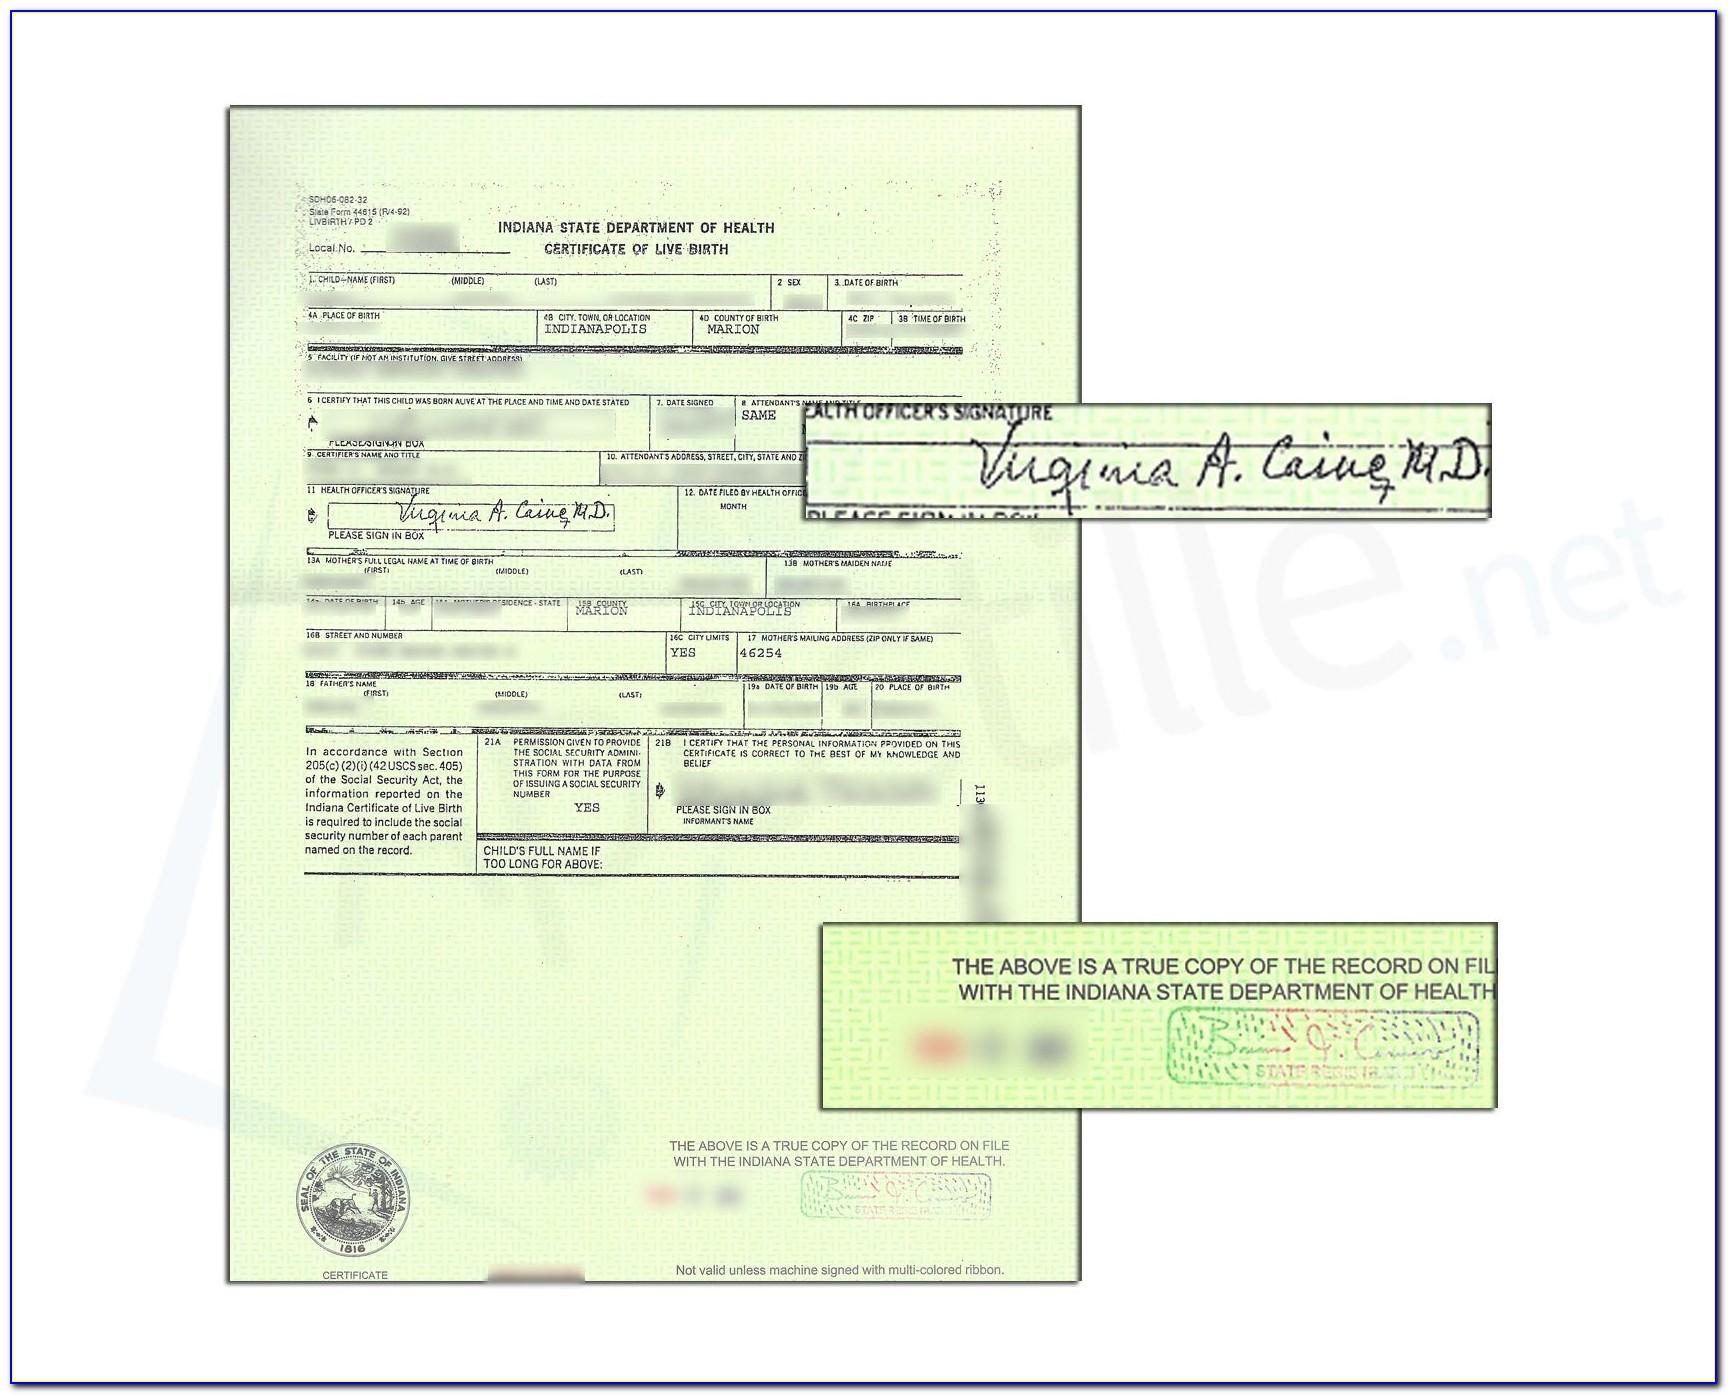 Marriage Certificate Apostille